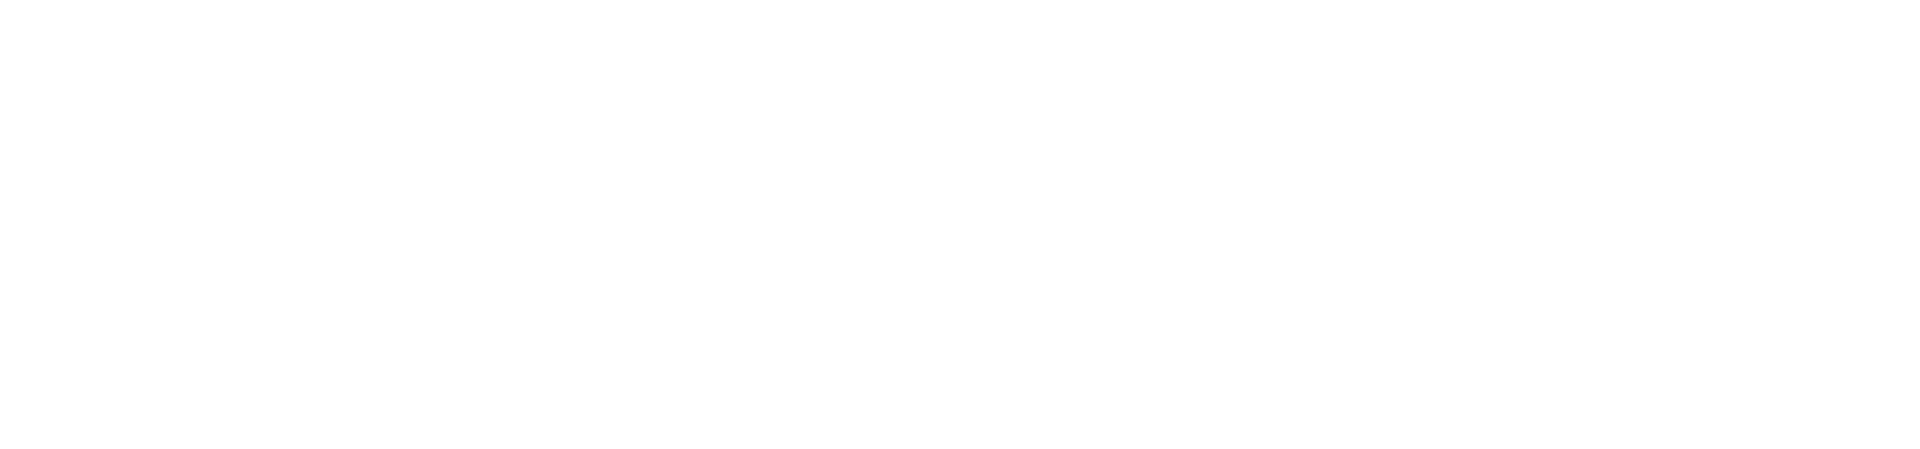 future transfers